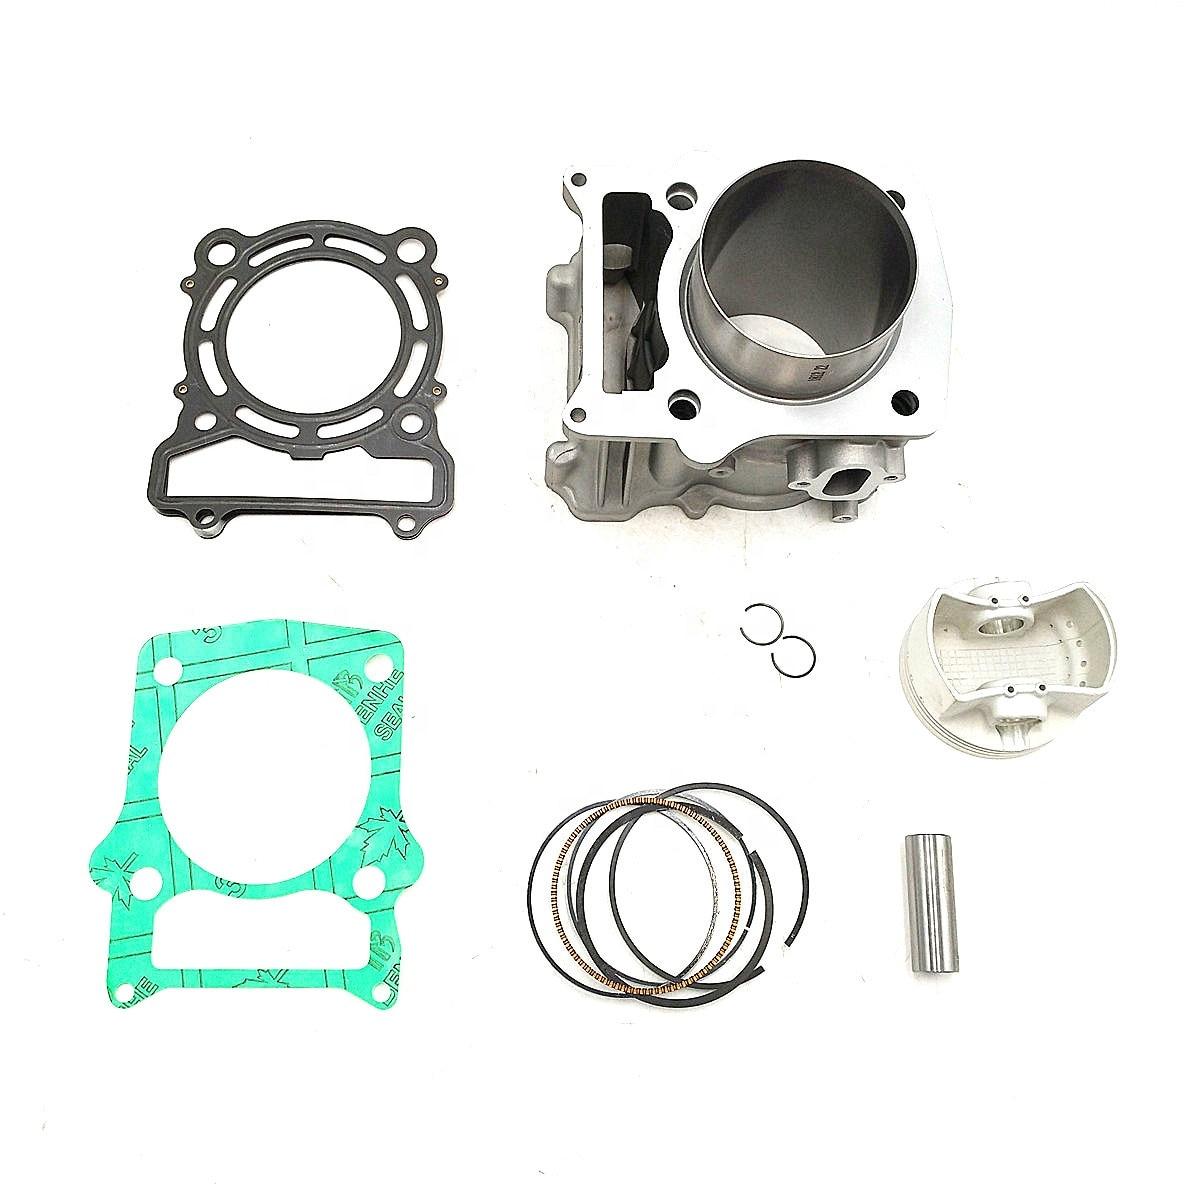 Hisun  ATV UTV 500 cc Cylinder kit Piston and Gasket kit for Dune Buggy 4x4 enlarge